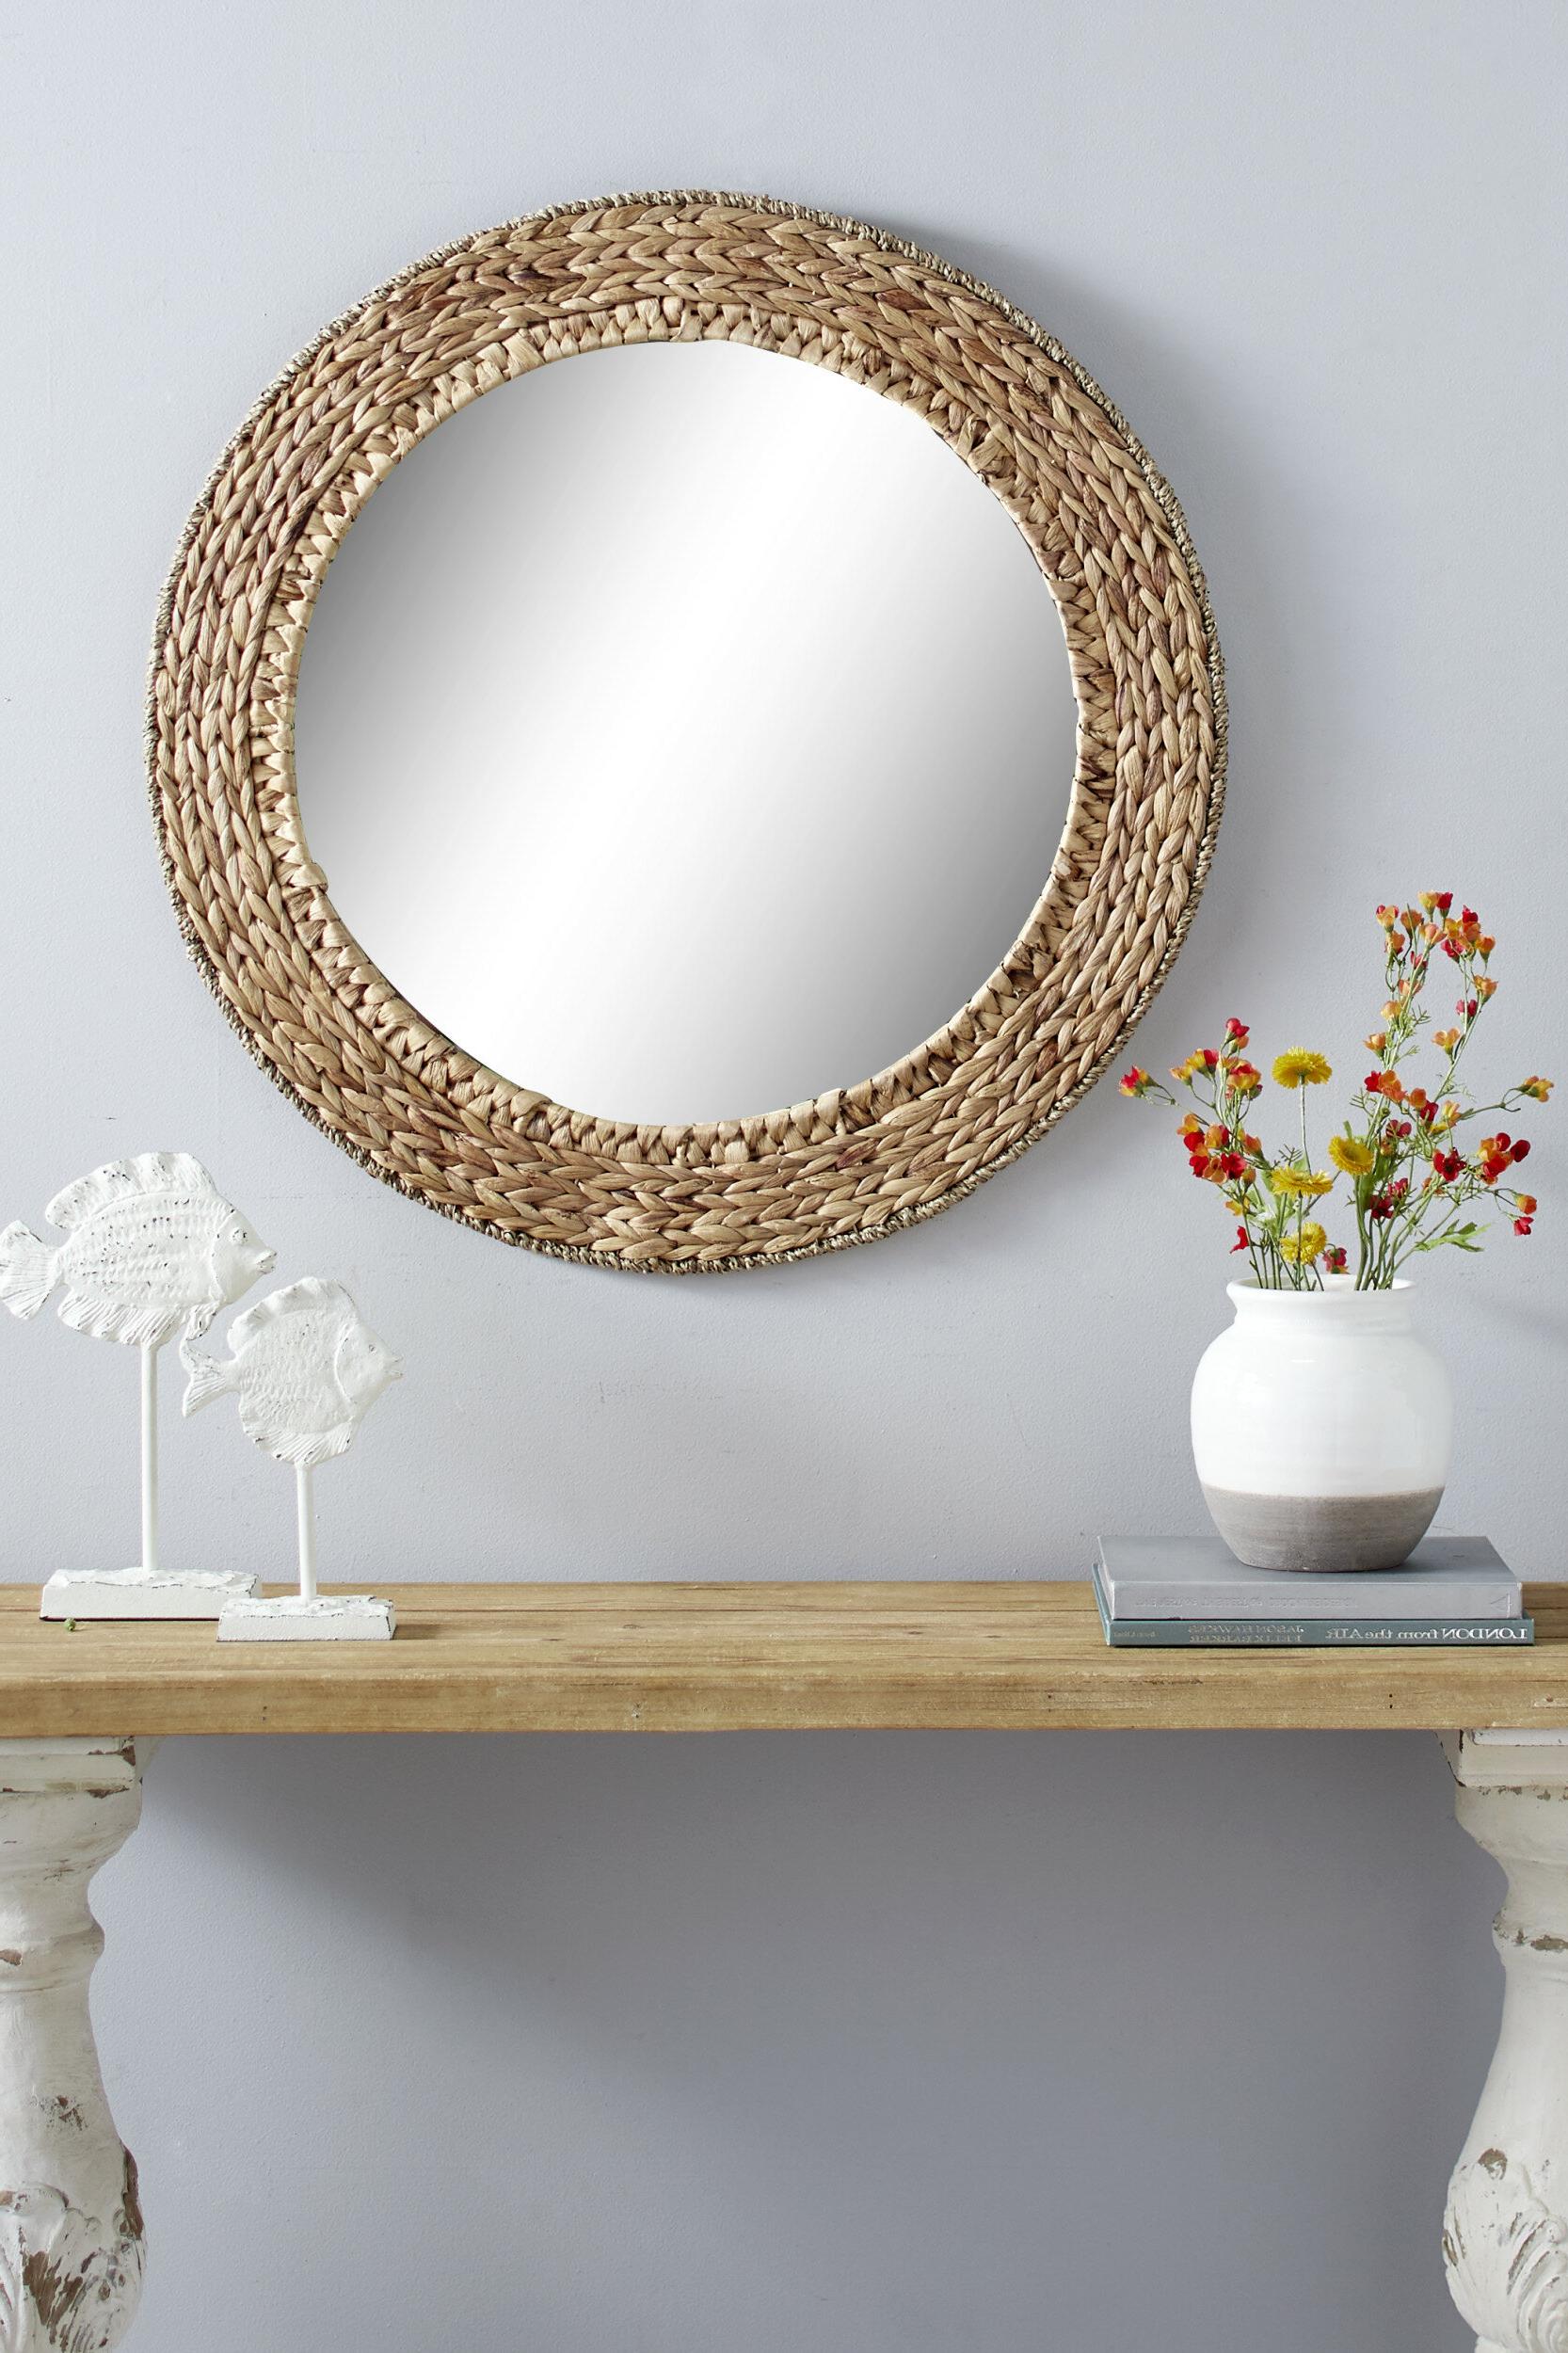 Well Known Bartolo Accent Mirrors Regarding Chiara Round Handmade Wicker Rustic Accent Mirror (View 15 of 20)